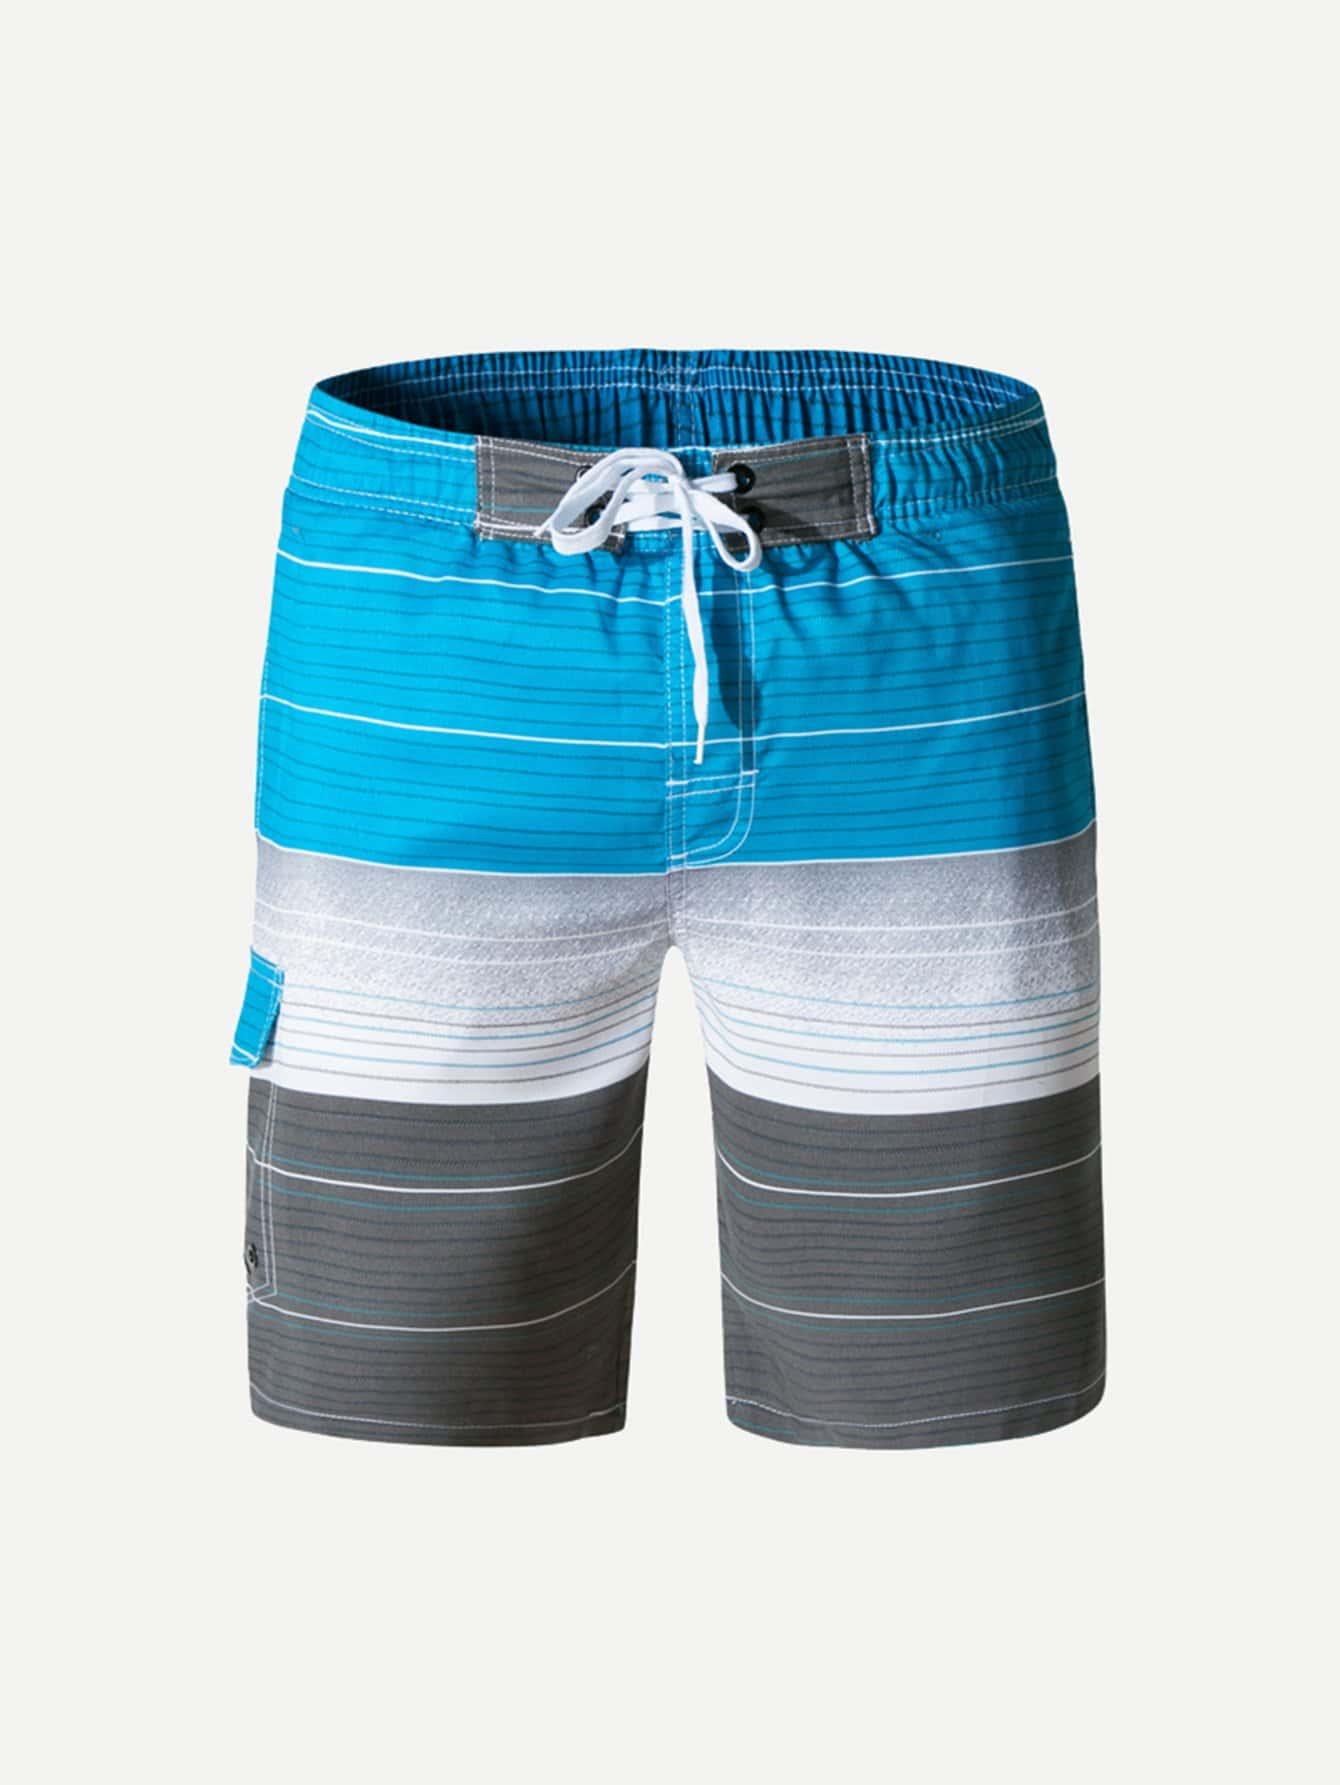 Men Drawstring Striped Beach Shorts men colorful striped drawstring shorts